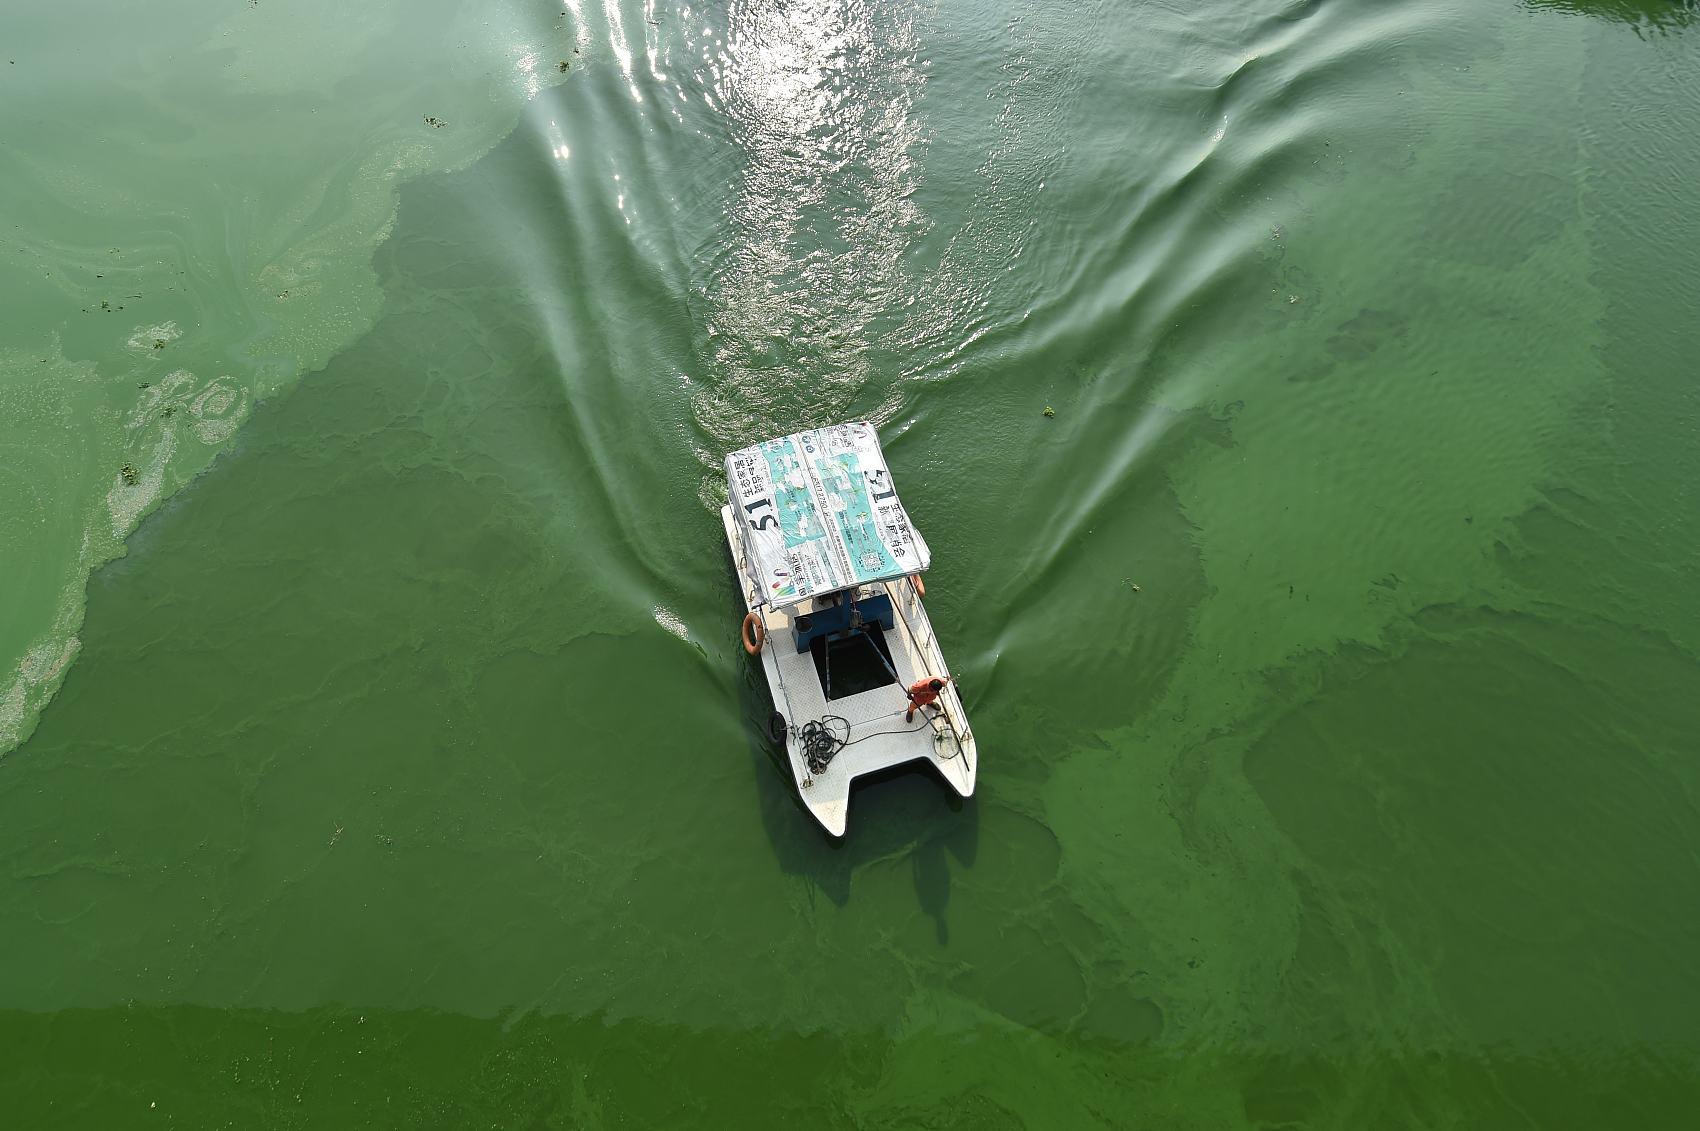 Raging blue algae seen in Hefei